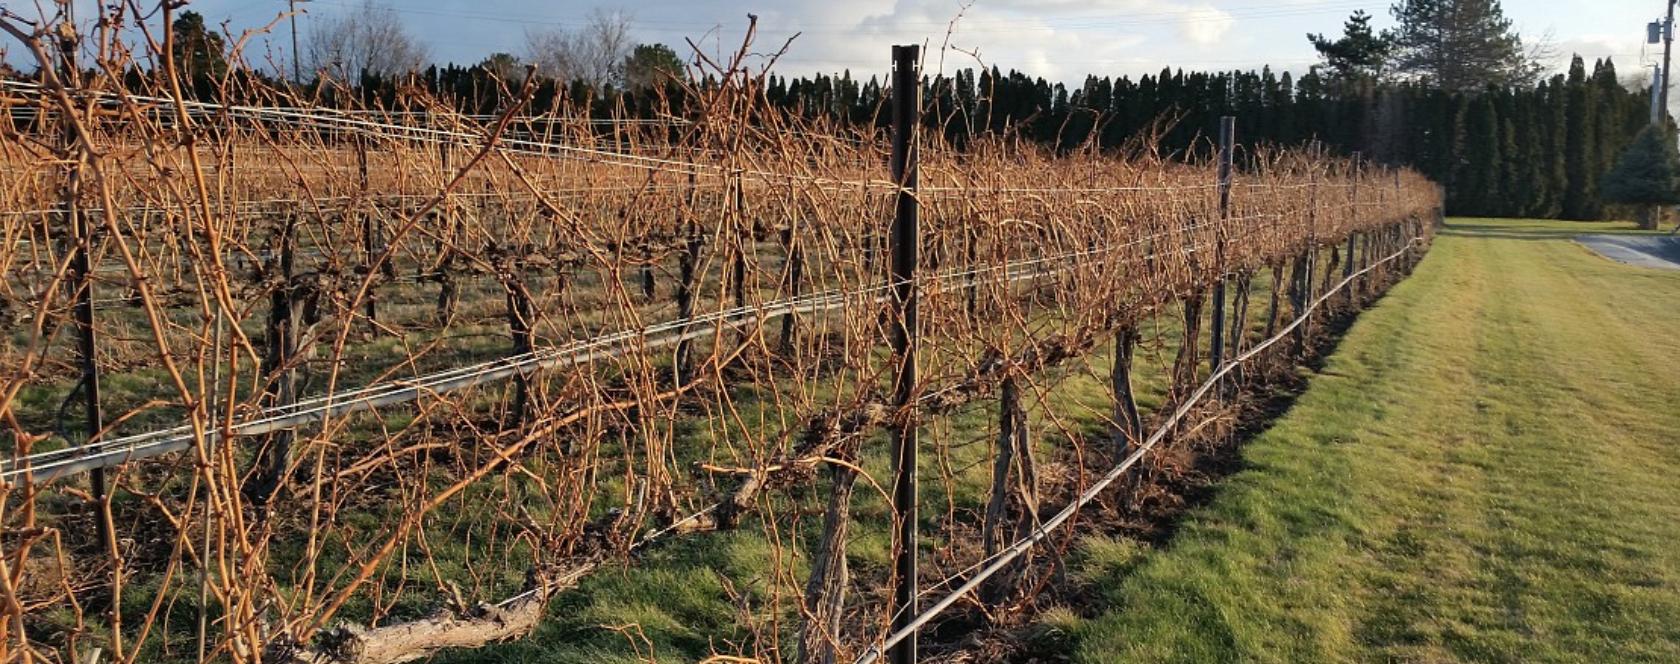 Mackey Vineyards Cover Image